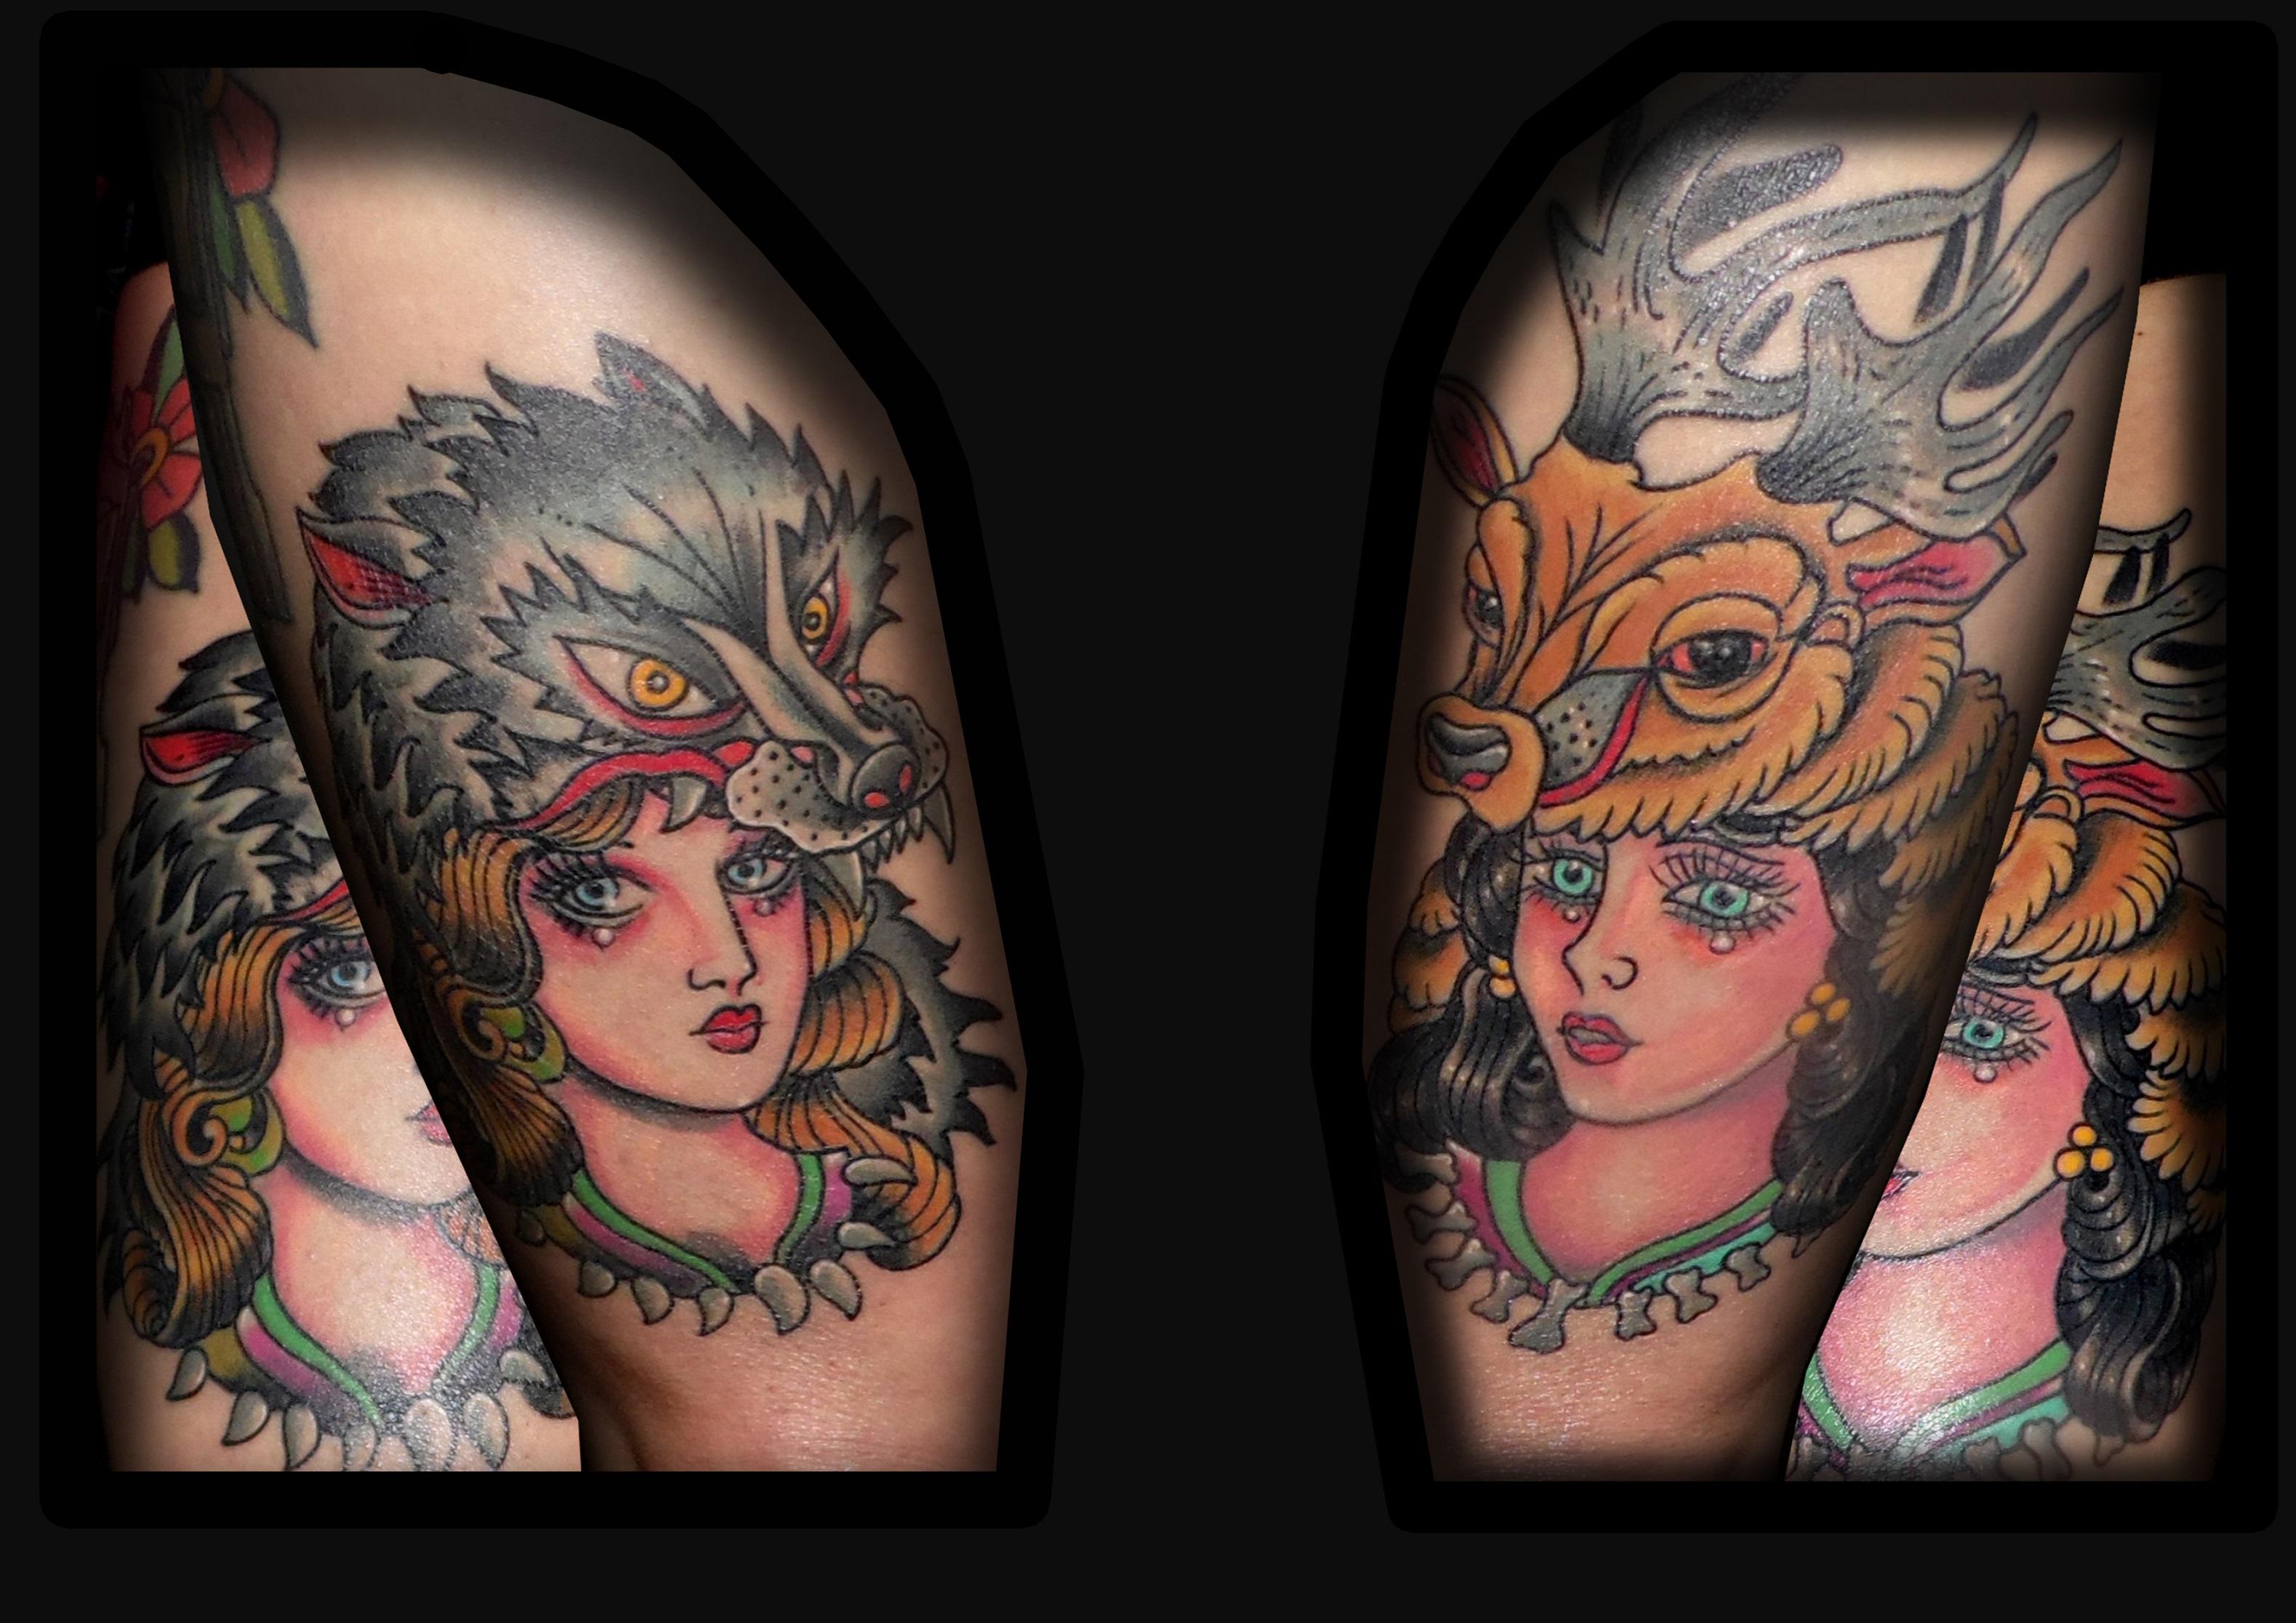 tatuaje tattoo traditional tradicional old school color muslo color chica lobo ciervo 13depicas jaca huesca